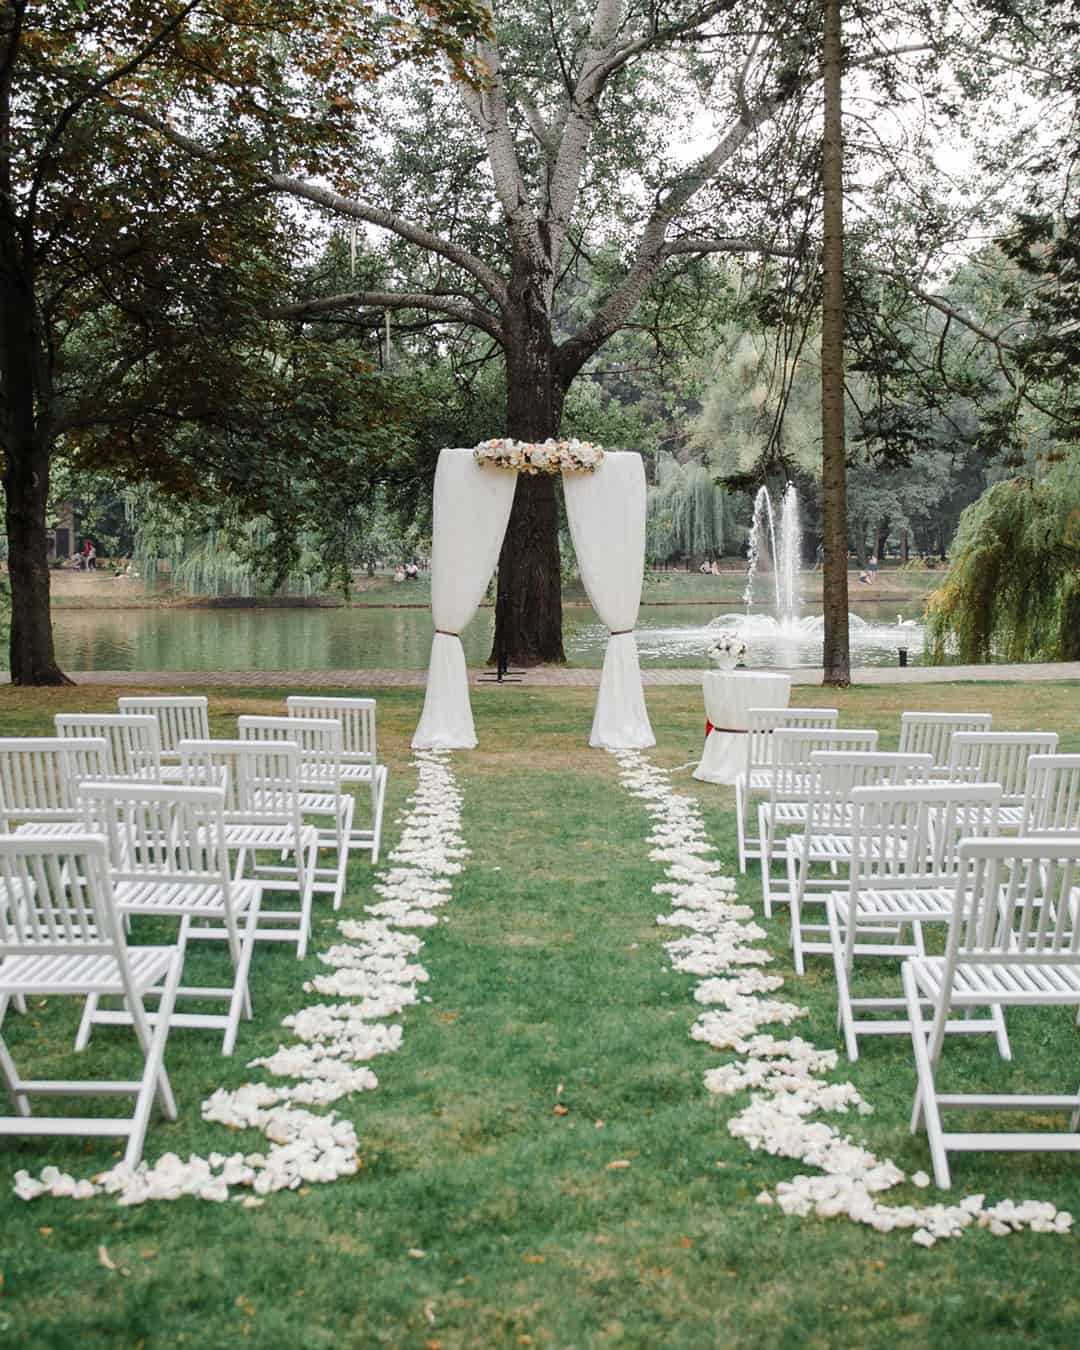 Your Backyard Wedding Rentals Checklist ⋆ Ruffled